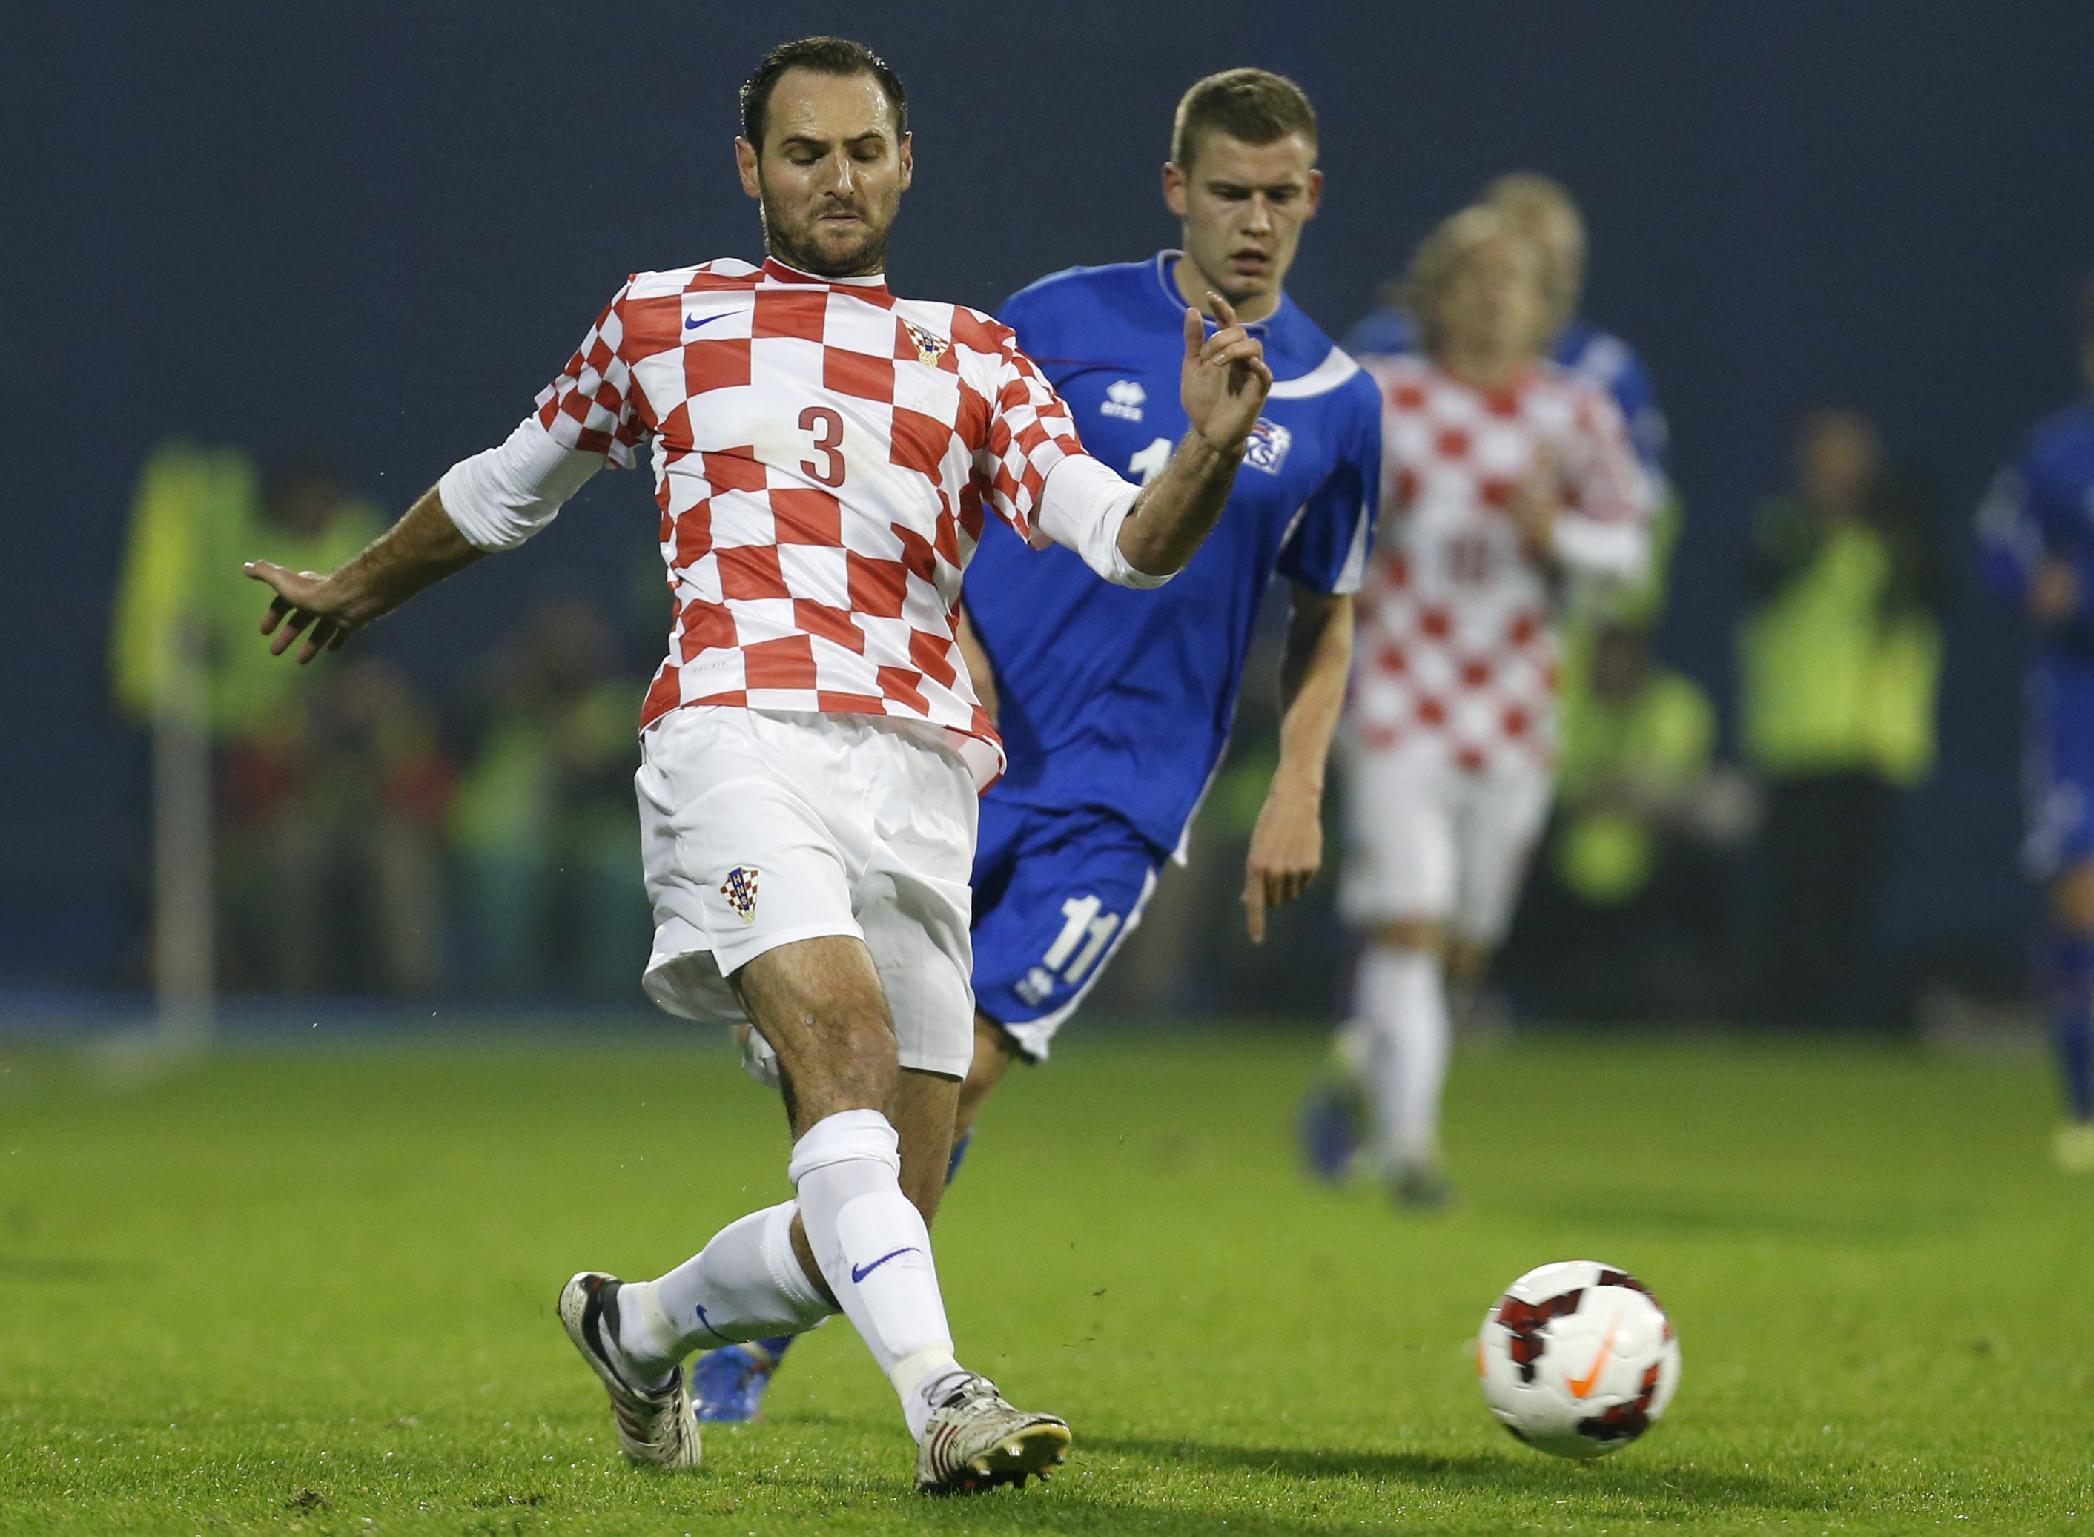 Croatian player fined for pro-Nazi chants